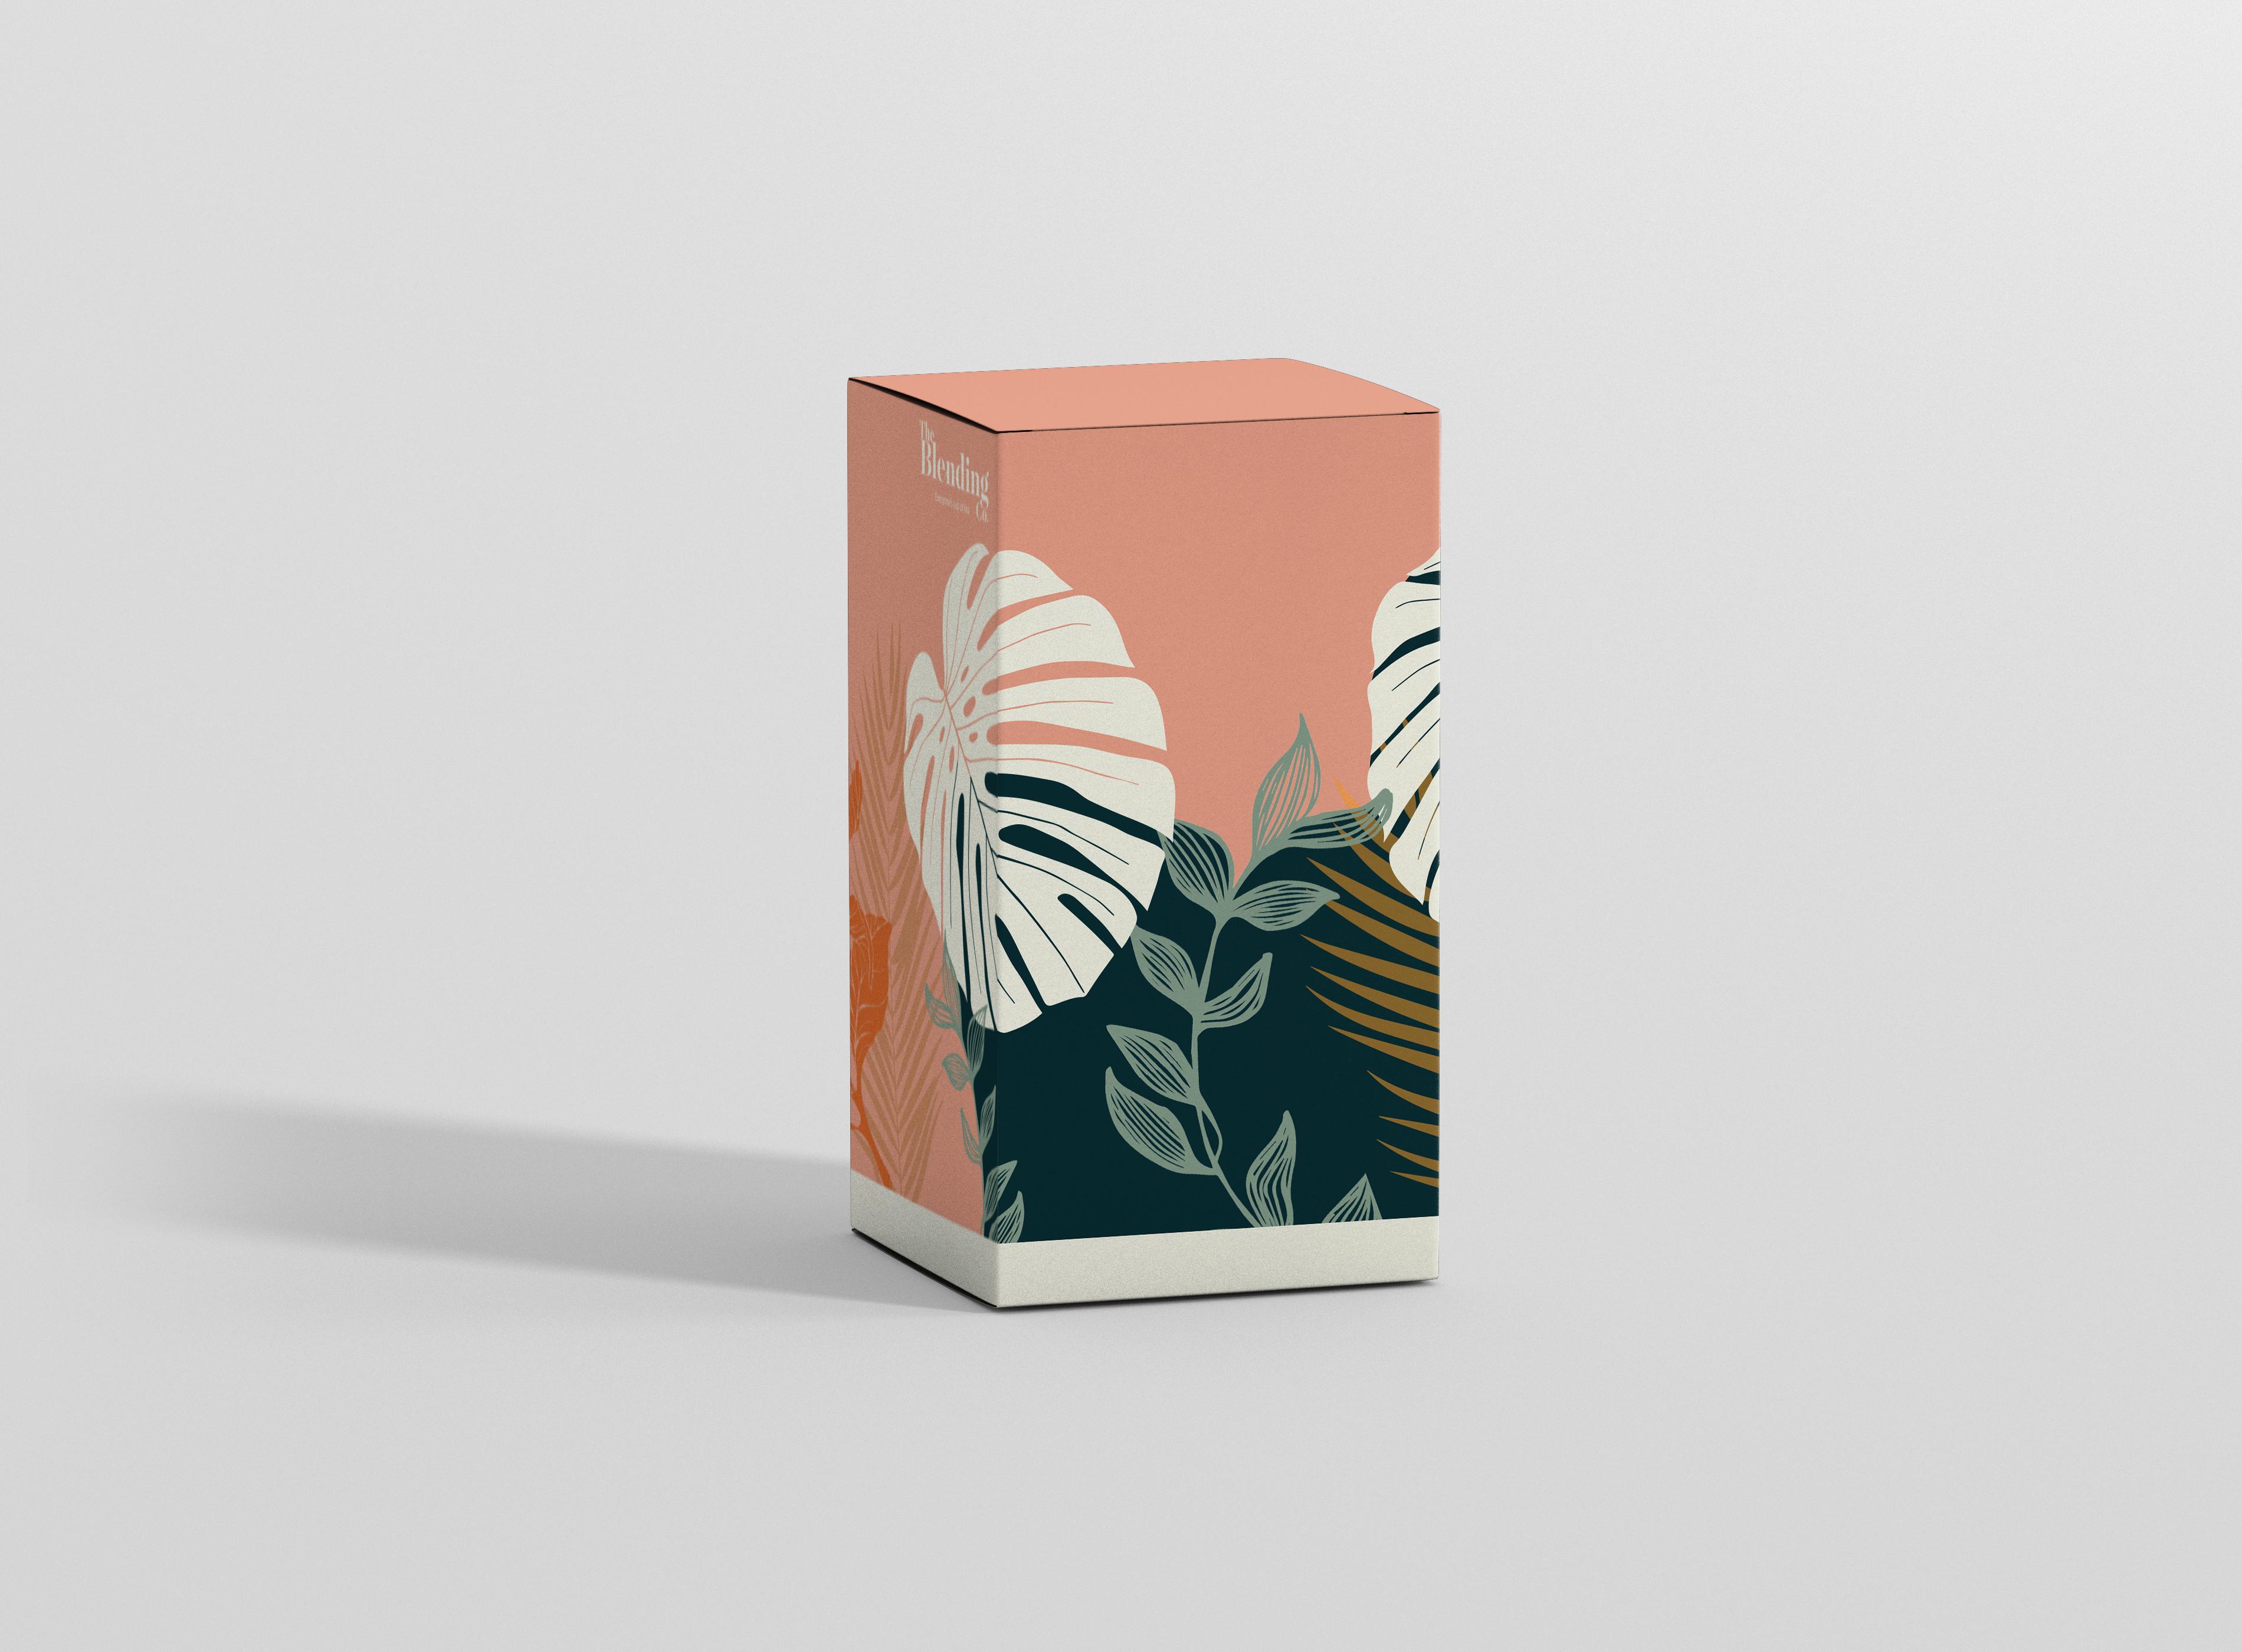 mockup box 3